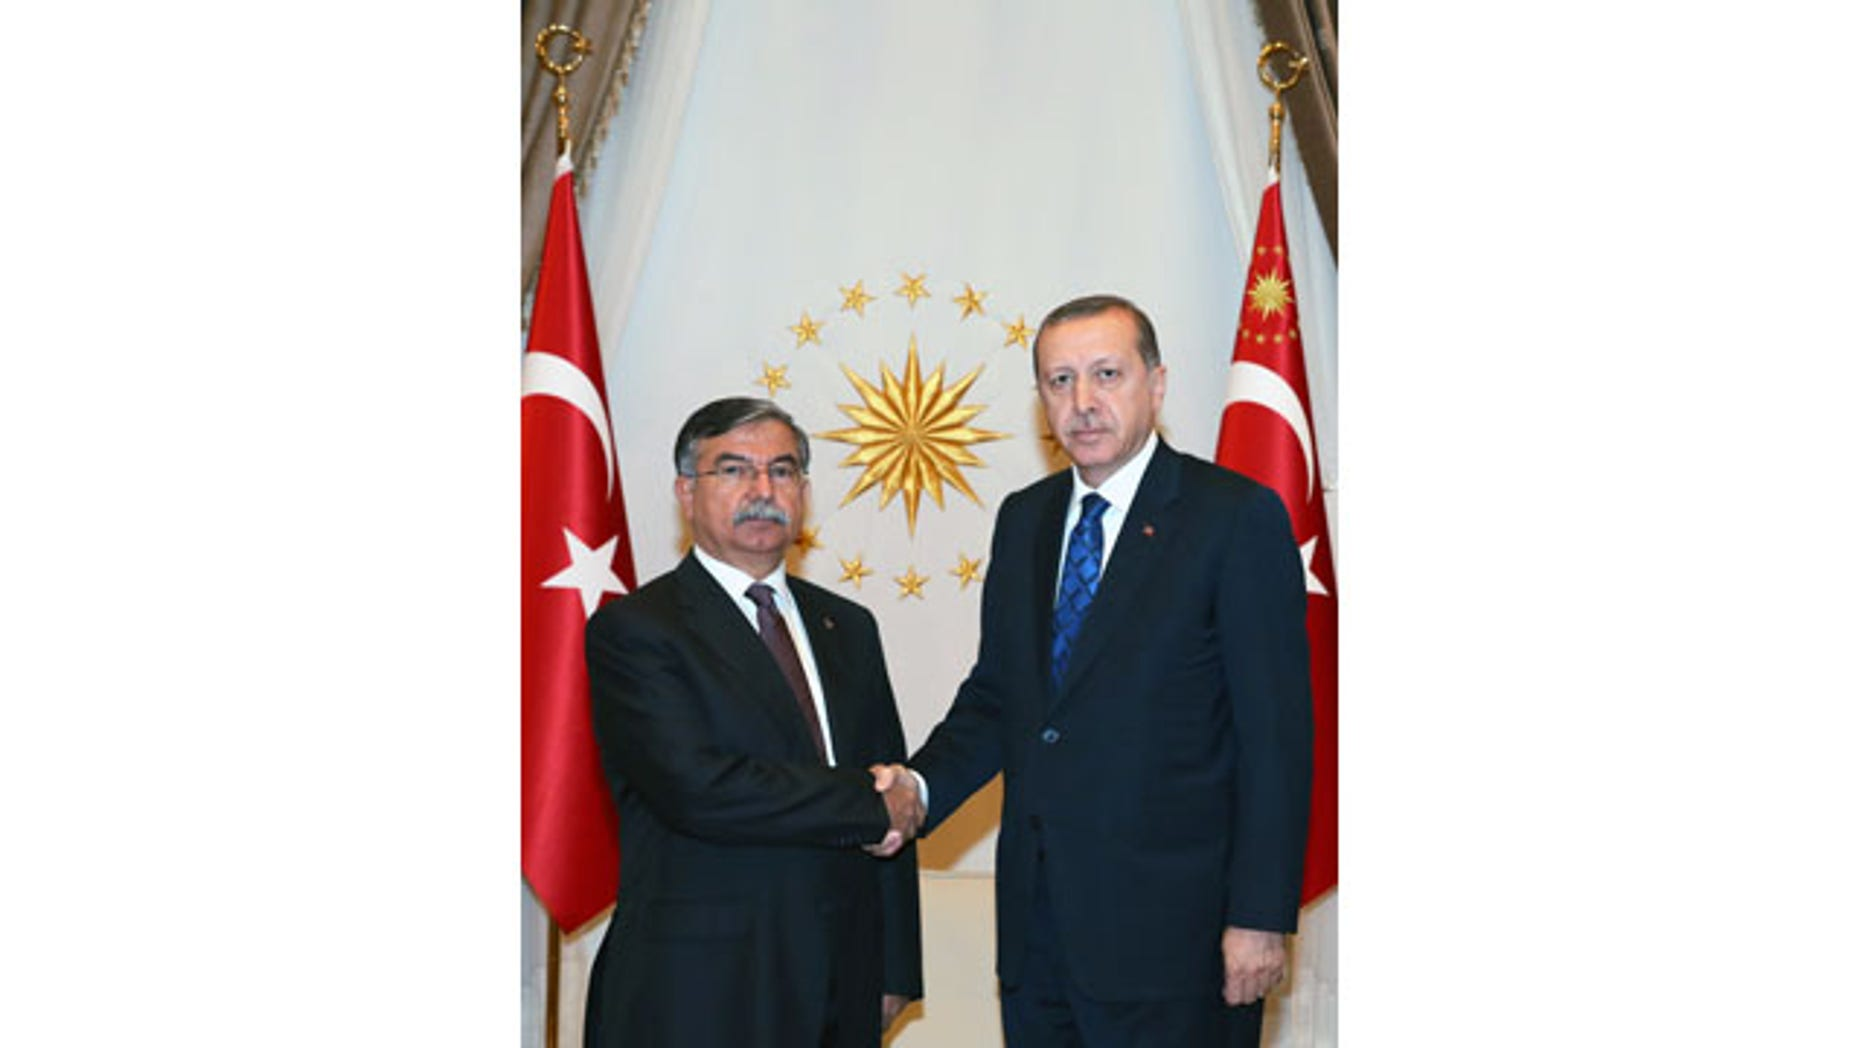 Aug. 24, 2015: Turkey's President Recep Tayyip Erdogan, right, shakes hands with Parliament Speaker Ismet Yilmaz in Ankara. (AP Photo/Presidential Press Service, Pool)